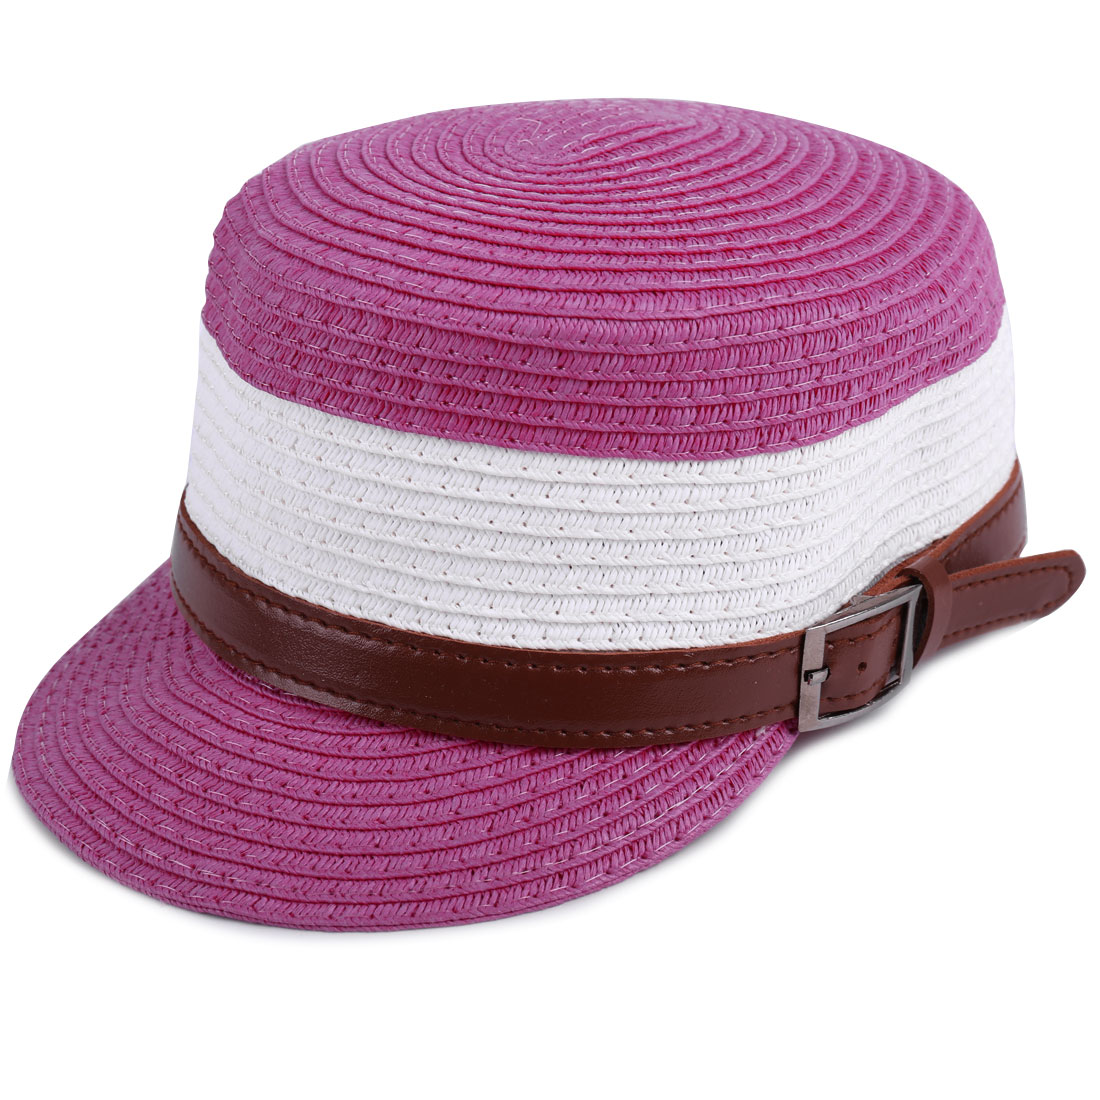 Contrast Color Belt Decor Woven Straw Cap for Kids Fuchsia White